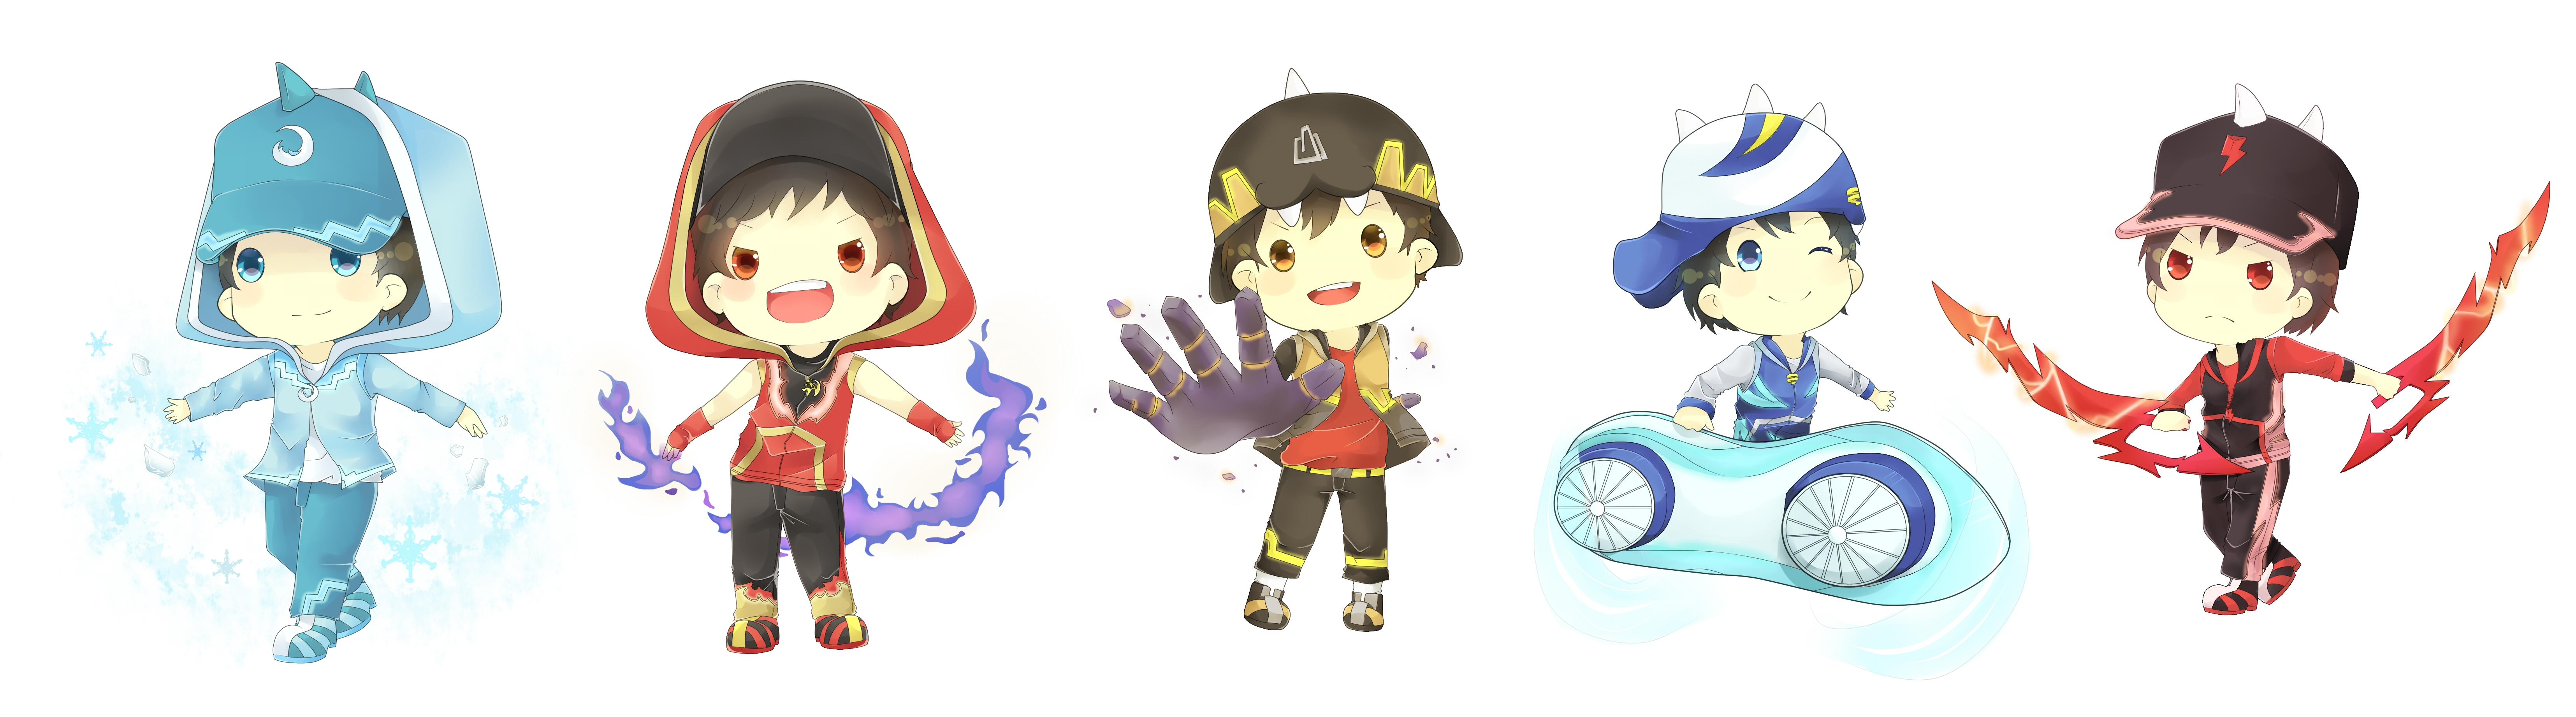 Boboiboy Zerochan Anime Image Board